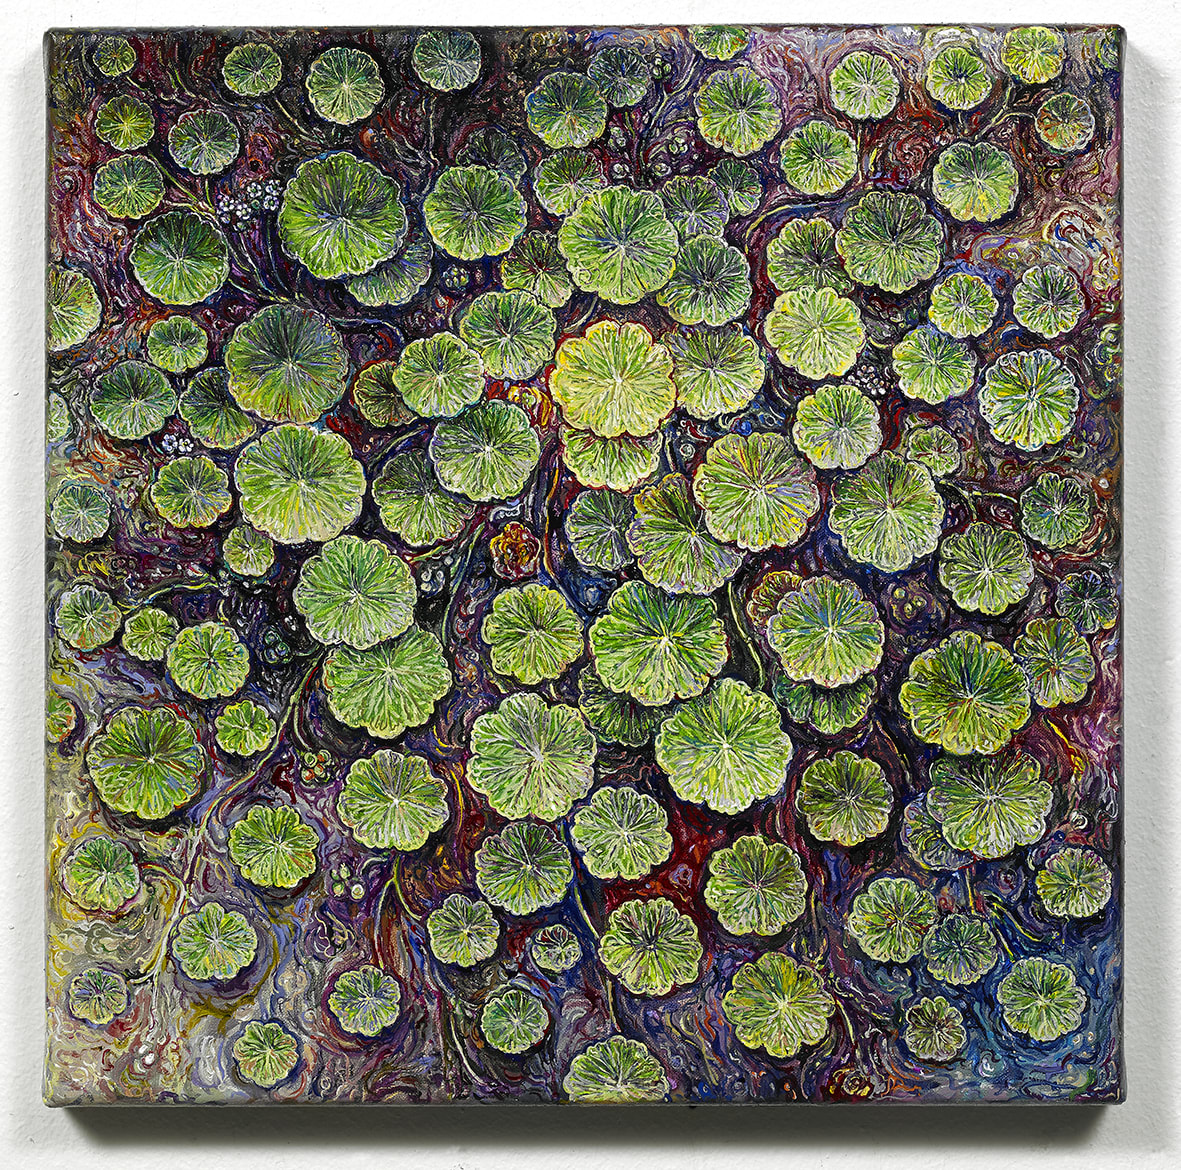 "<span class=""link fancybox-details-link""><a href=""/artists/136-eggert-petursson/works/9656/"">View Detail Page</a></span><div class=""artist""><strong>EGGERT PÉTURSSON</strong></div> <div class=""title""><em>Untitled</em>, 2012-2013</div> <div class=""medium"">oil on canvas</div> <div class=""dimensions"">30 x 30 cm</div>"